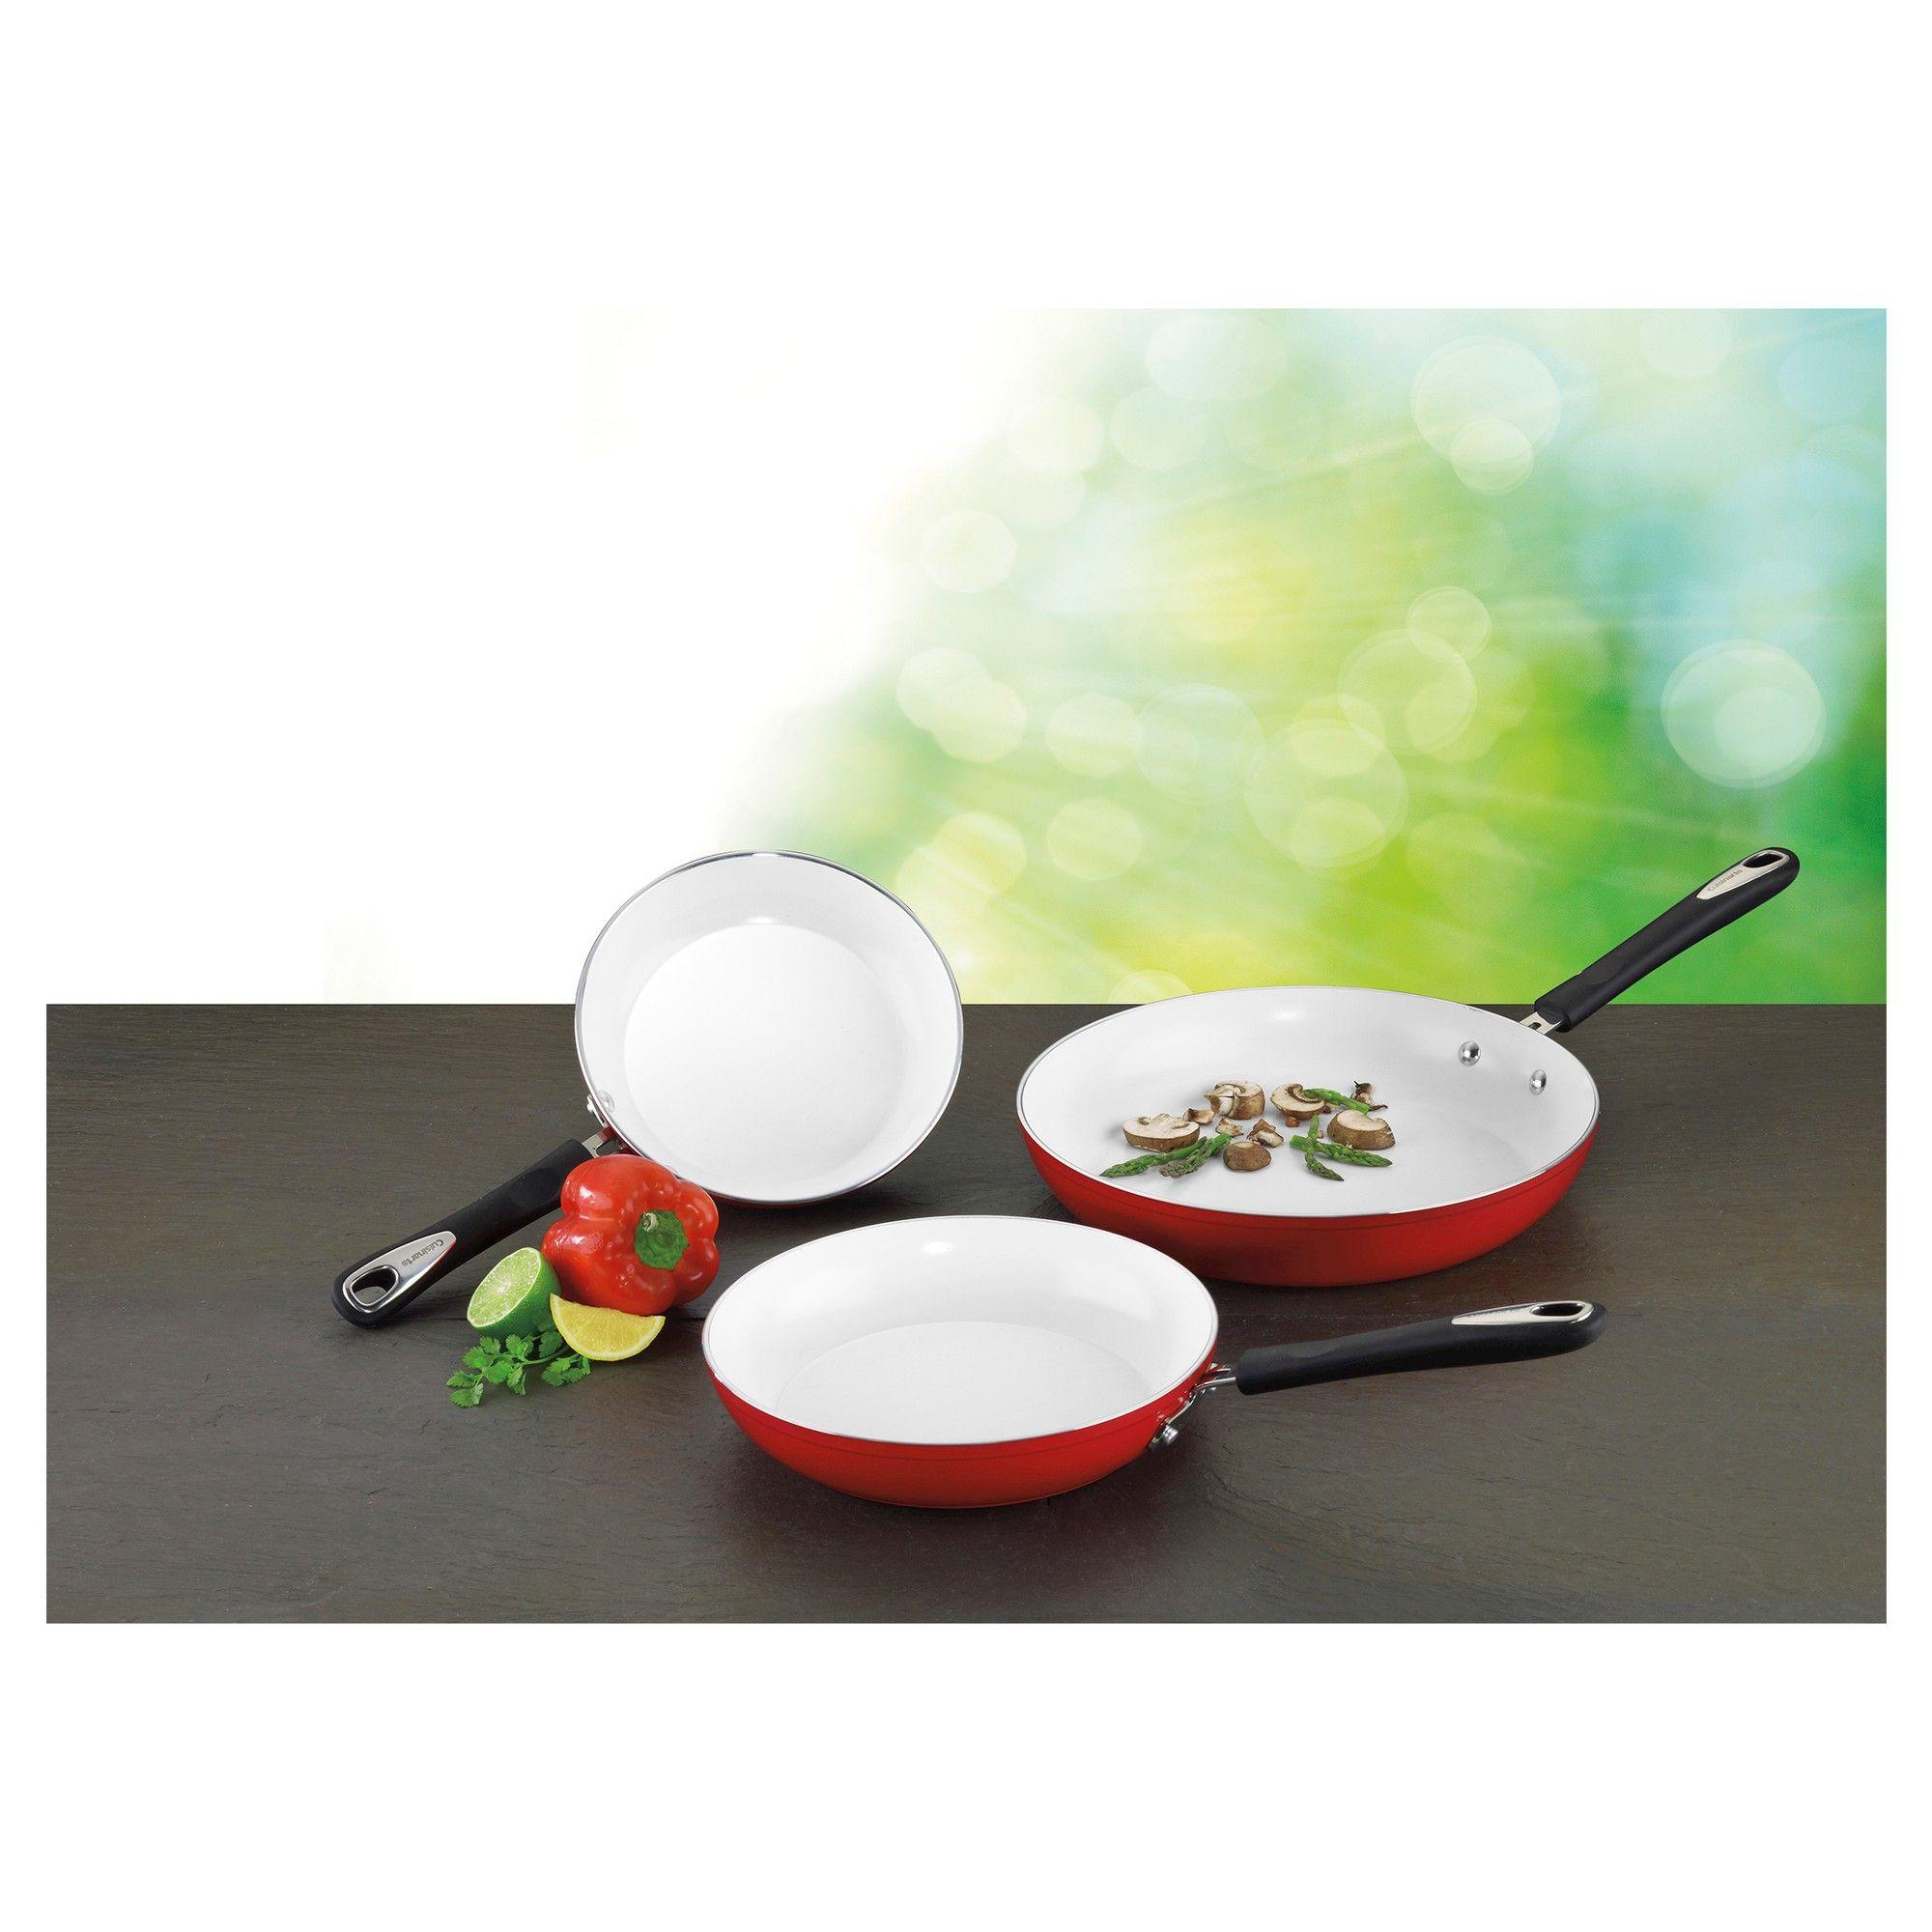 Cuisinart Elements Nonstick 8 10 12inch Skillet Set Red 5922 81012r Skillet Sets Cuisinart Nonstick